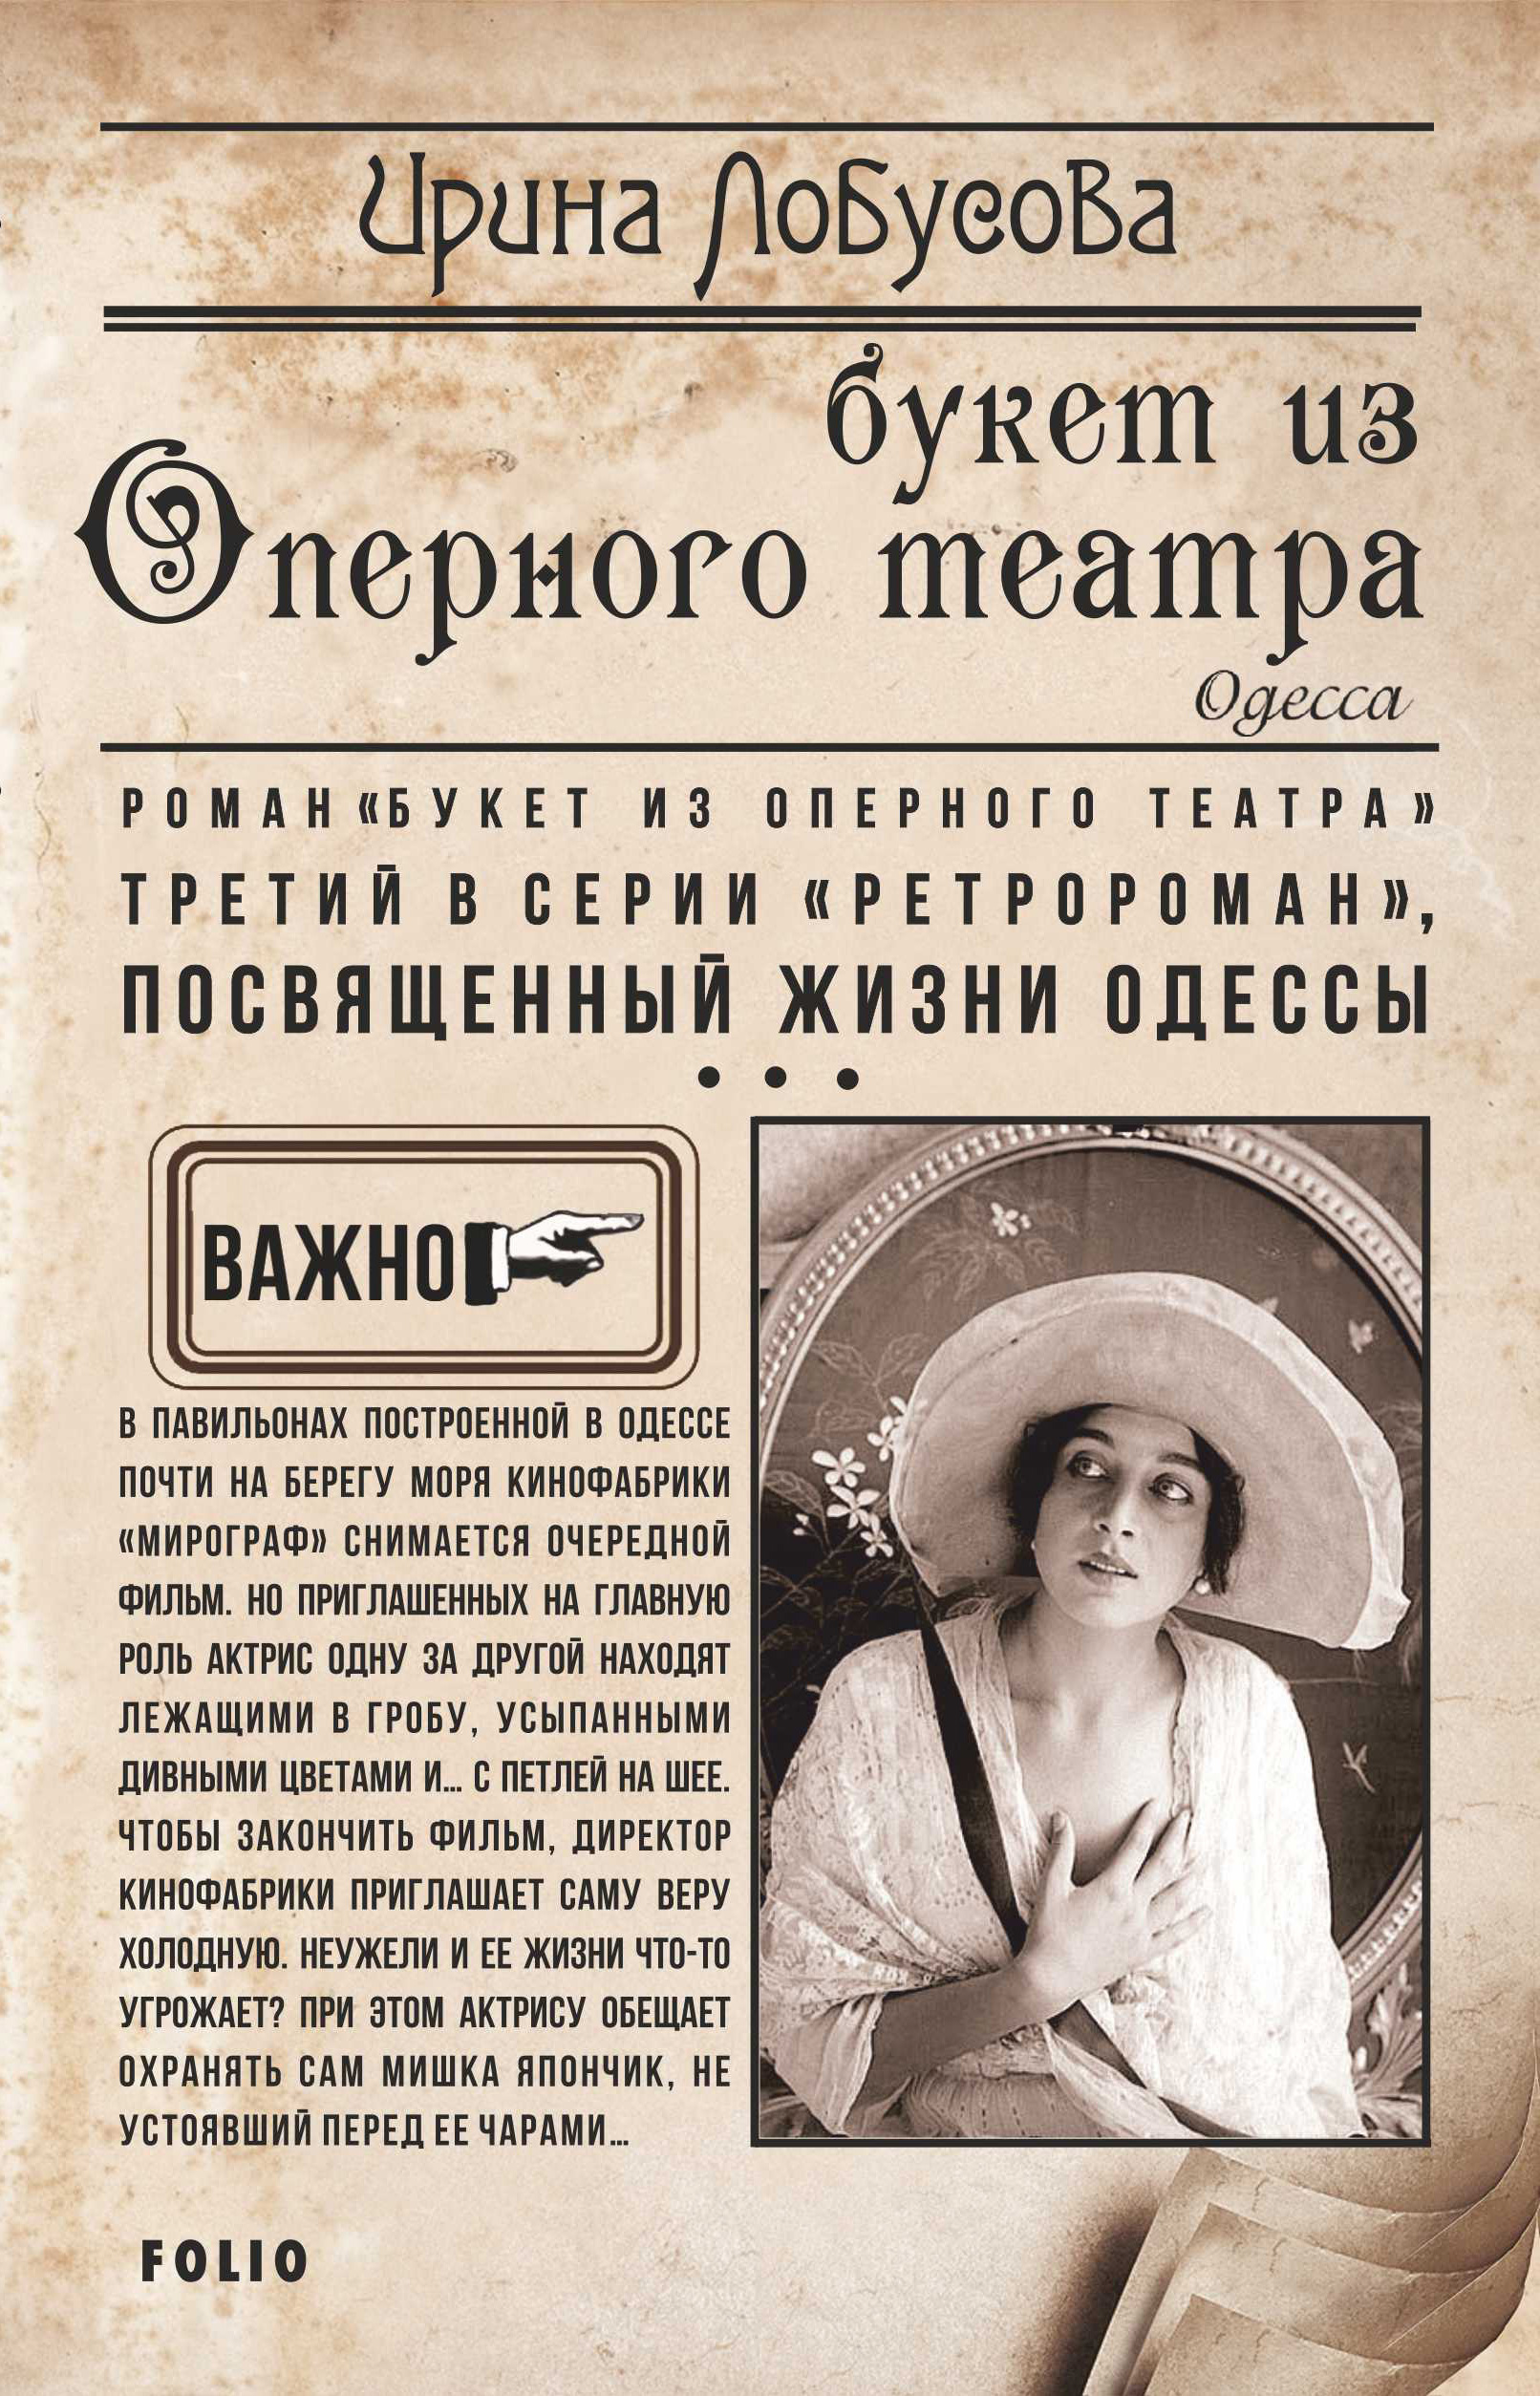 Ирина Лобусова Букет из Оперного театра